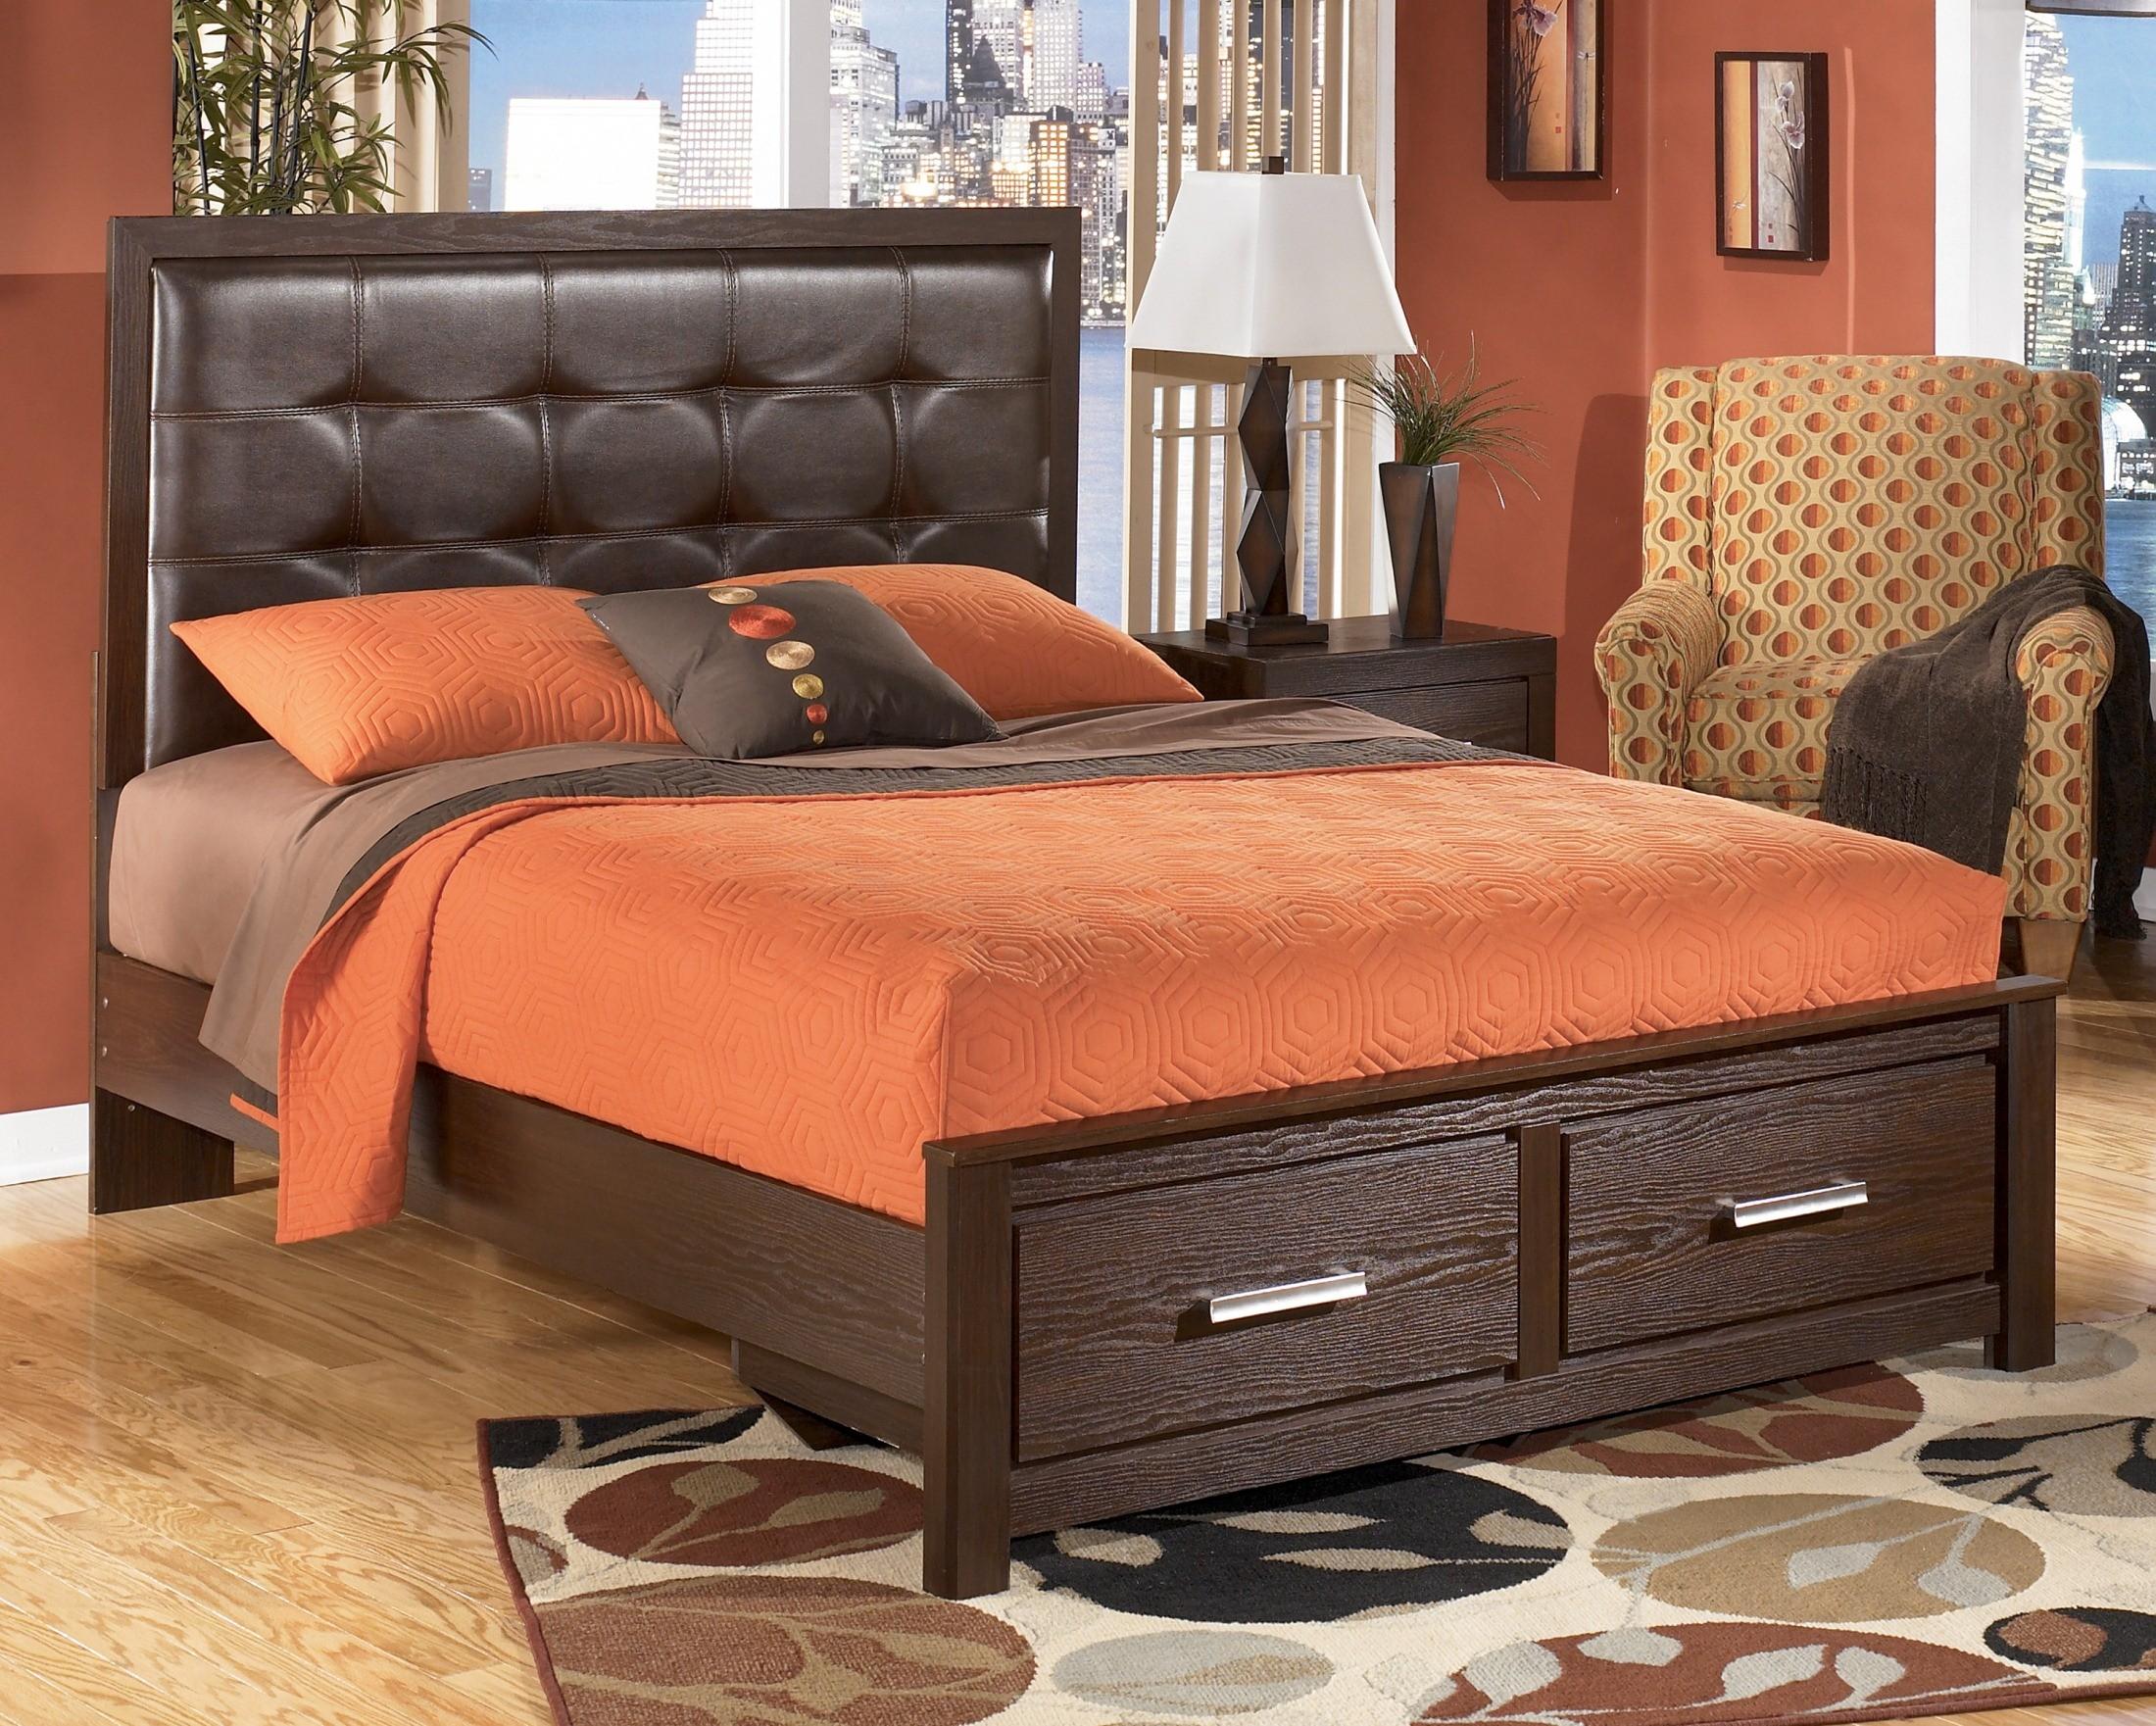 Aleydis Queen Upholstered Platform Storage Bed From Ashley Coleman Furniture